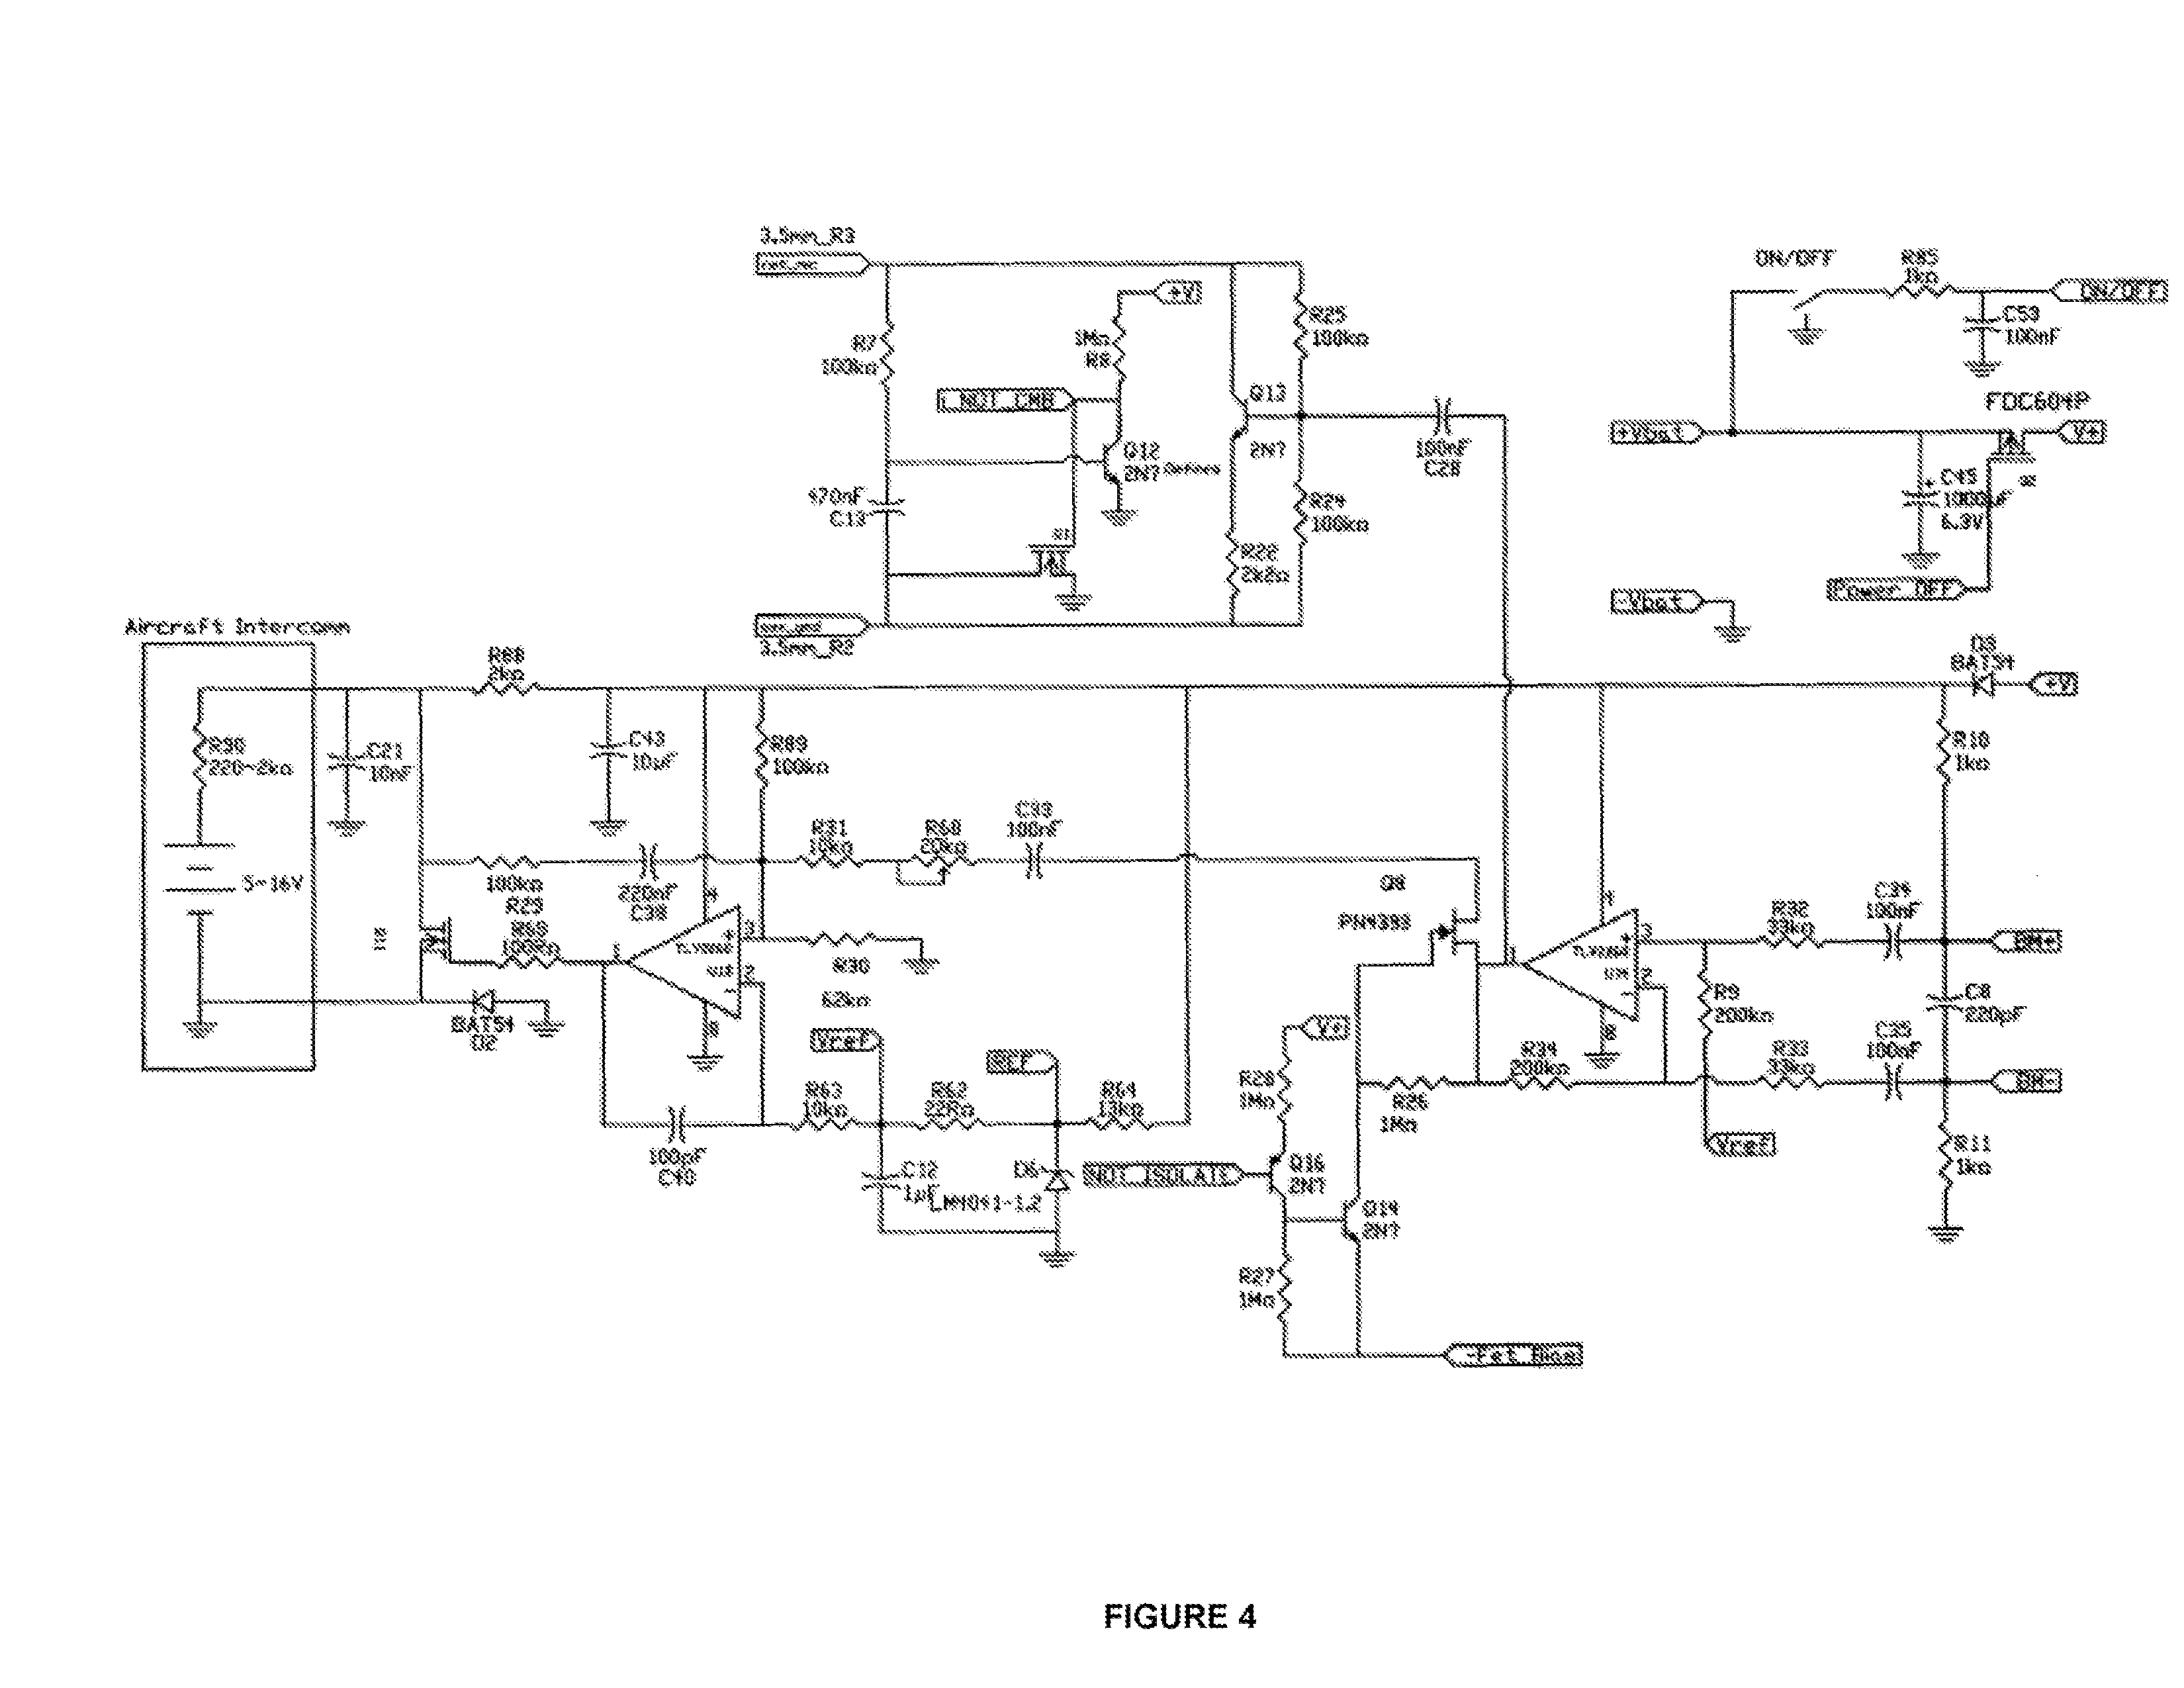 aviation intercom wiring diagram aircraft diagram elsavadorla